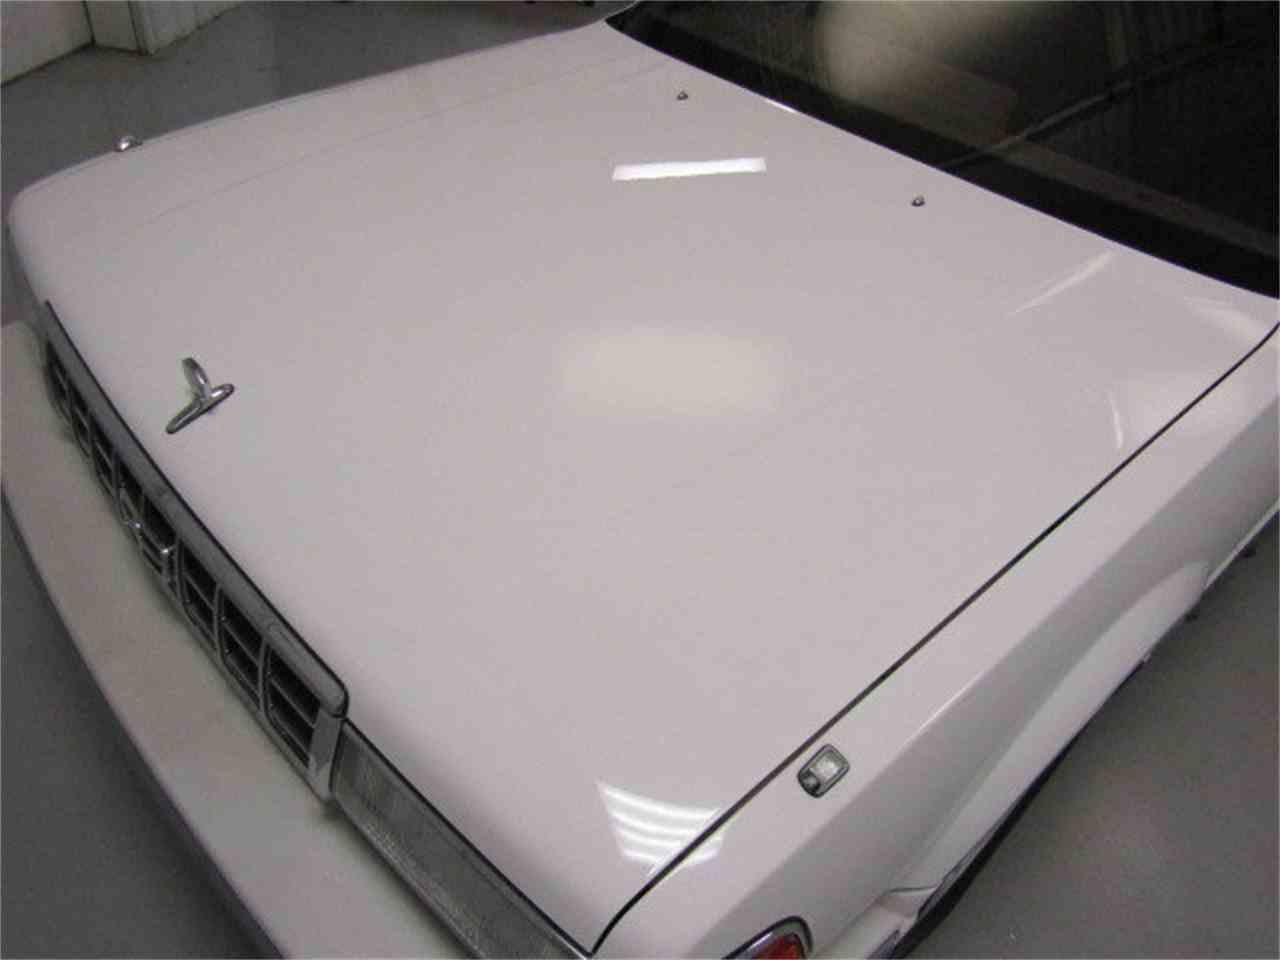 Large Picture of 1991 Nissan Gloria located in Virginia - $6,999.00 - JZ2U